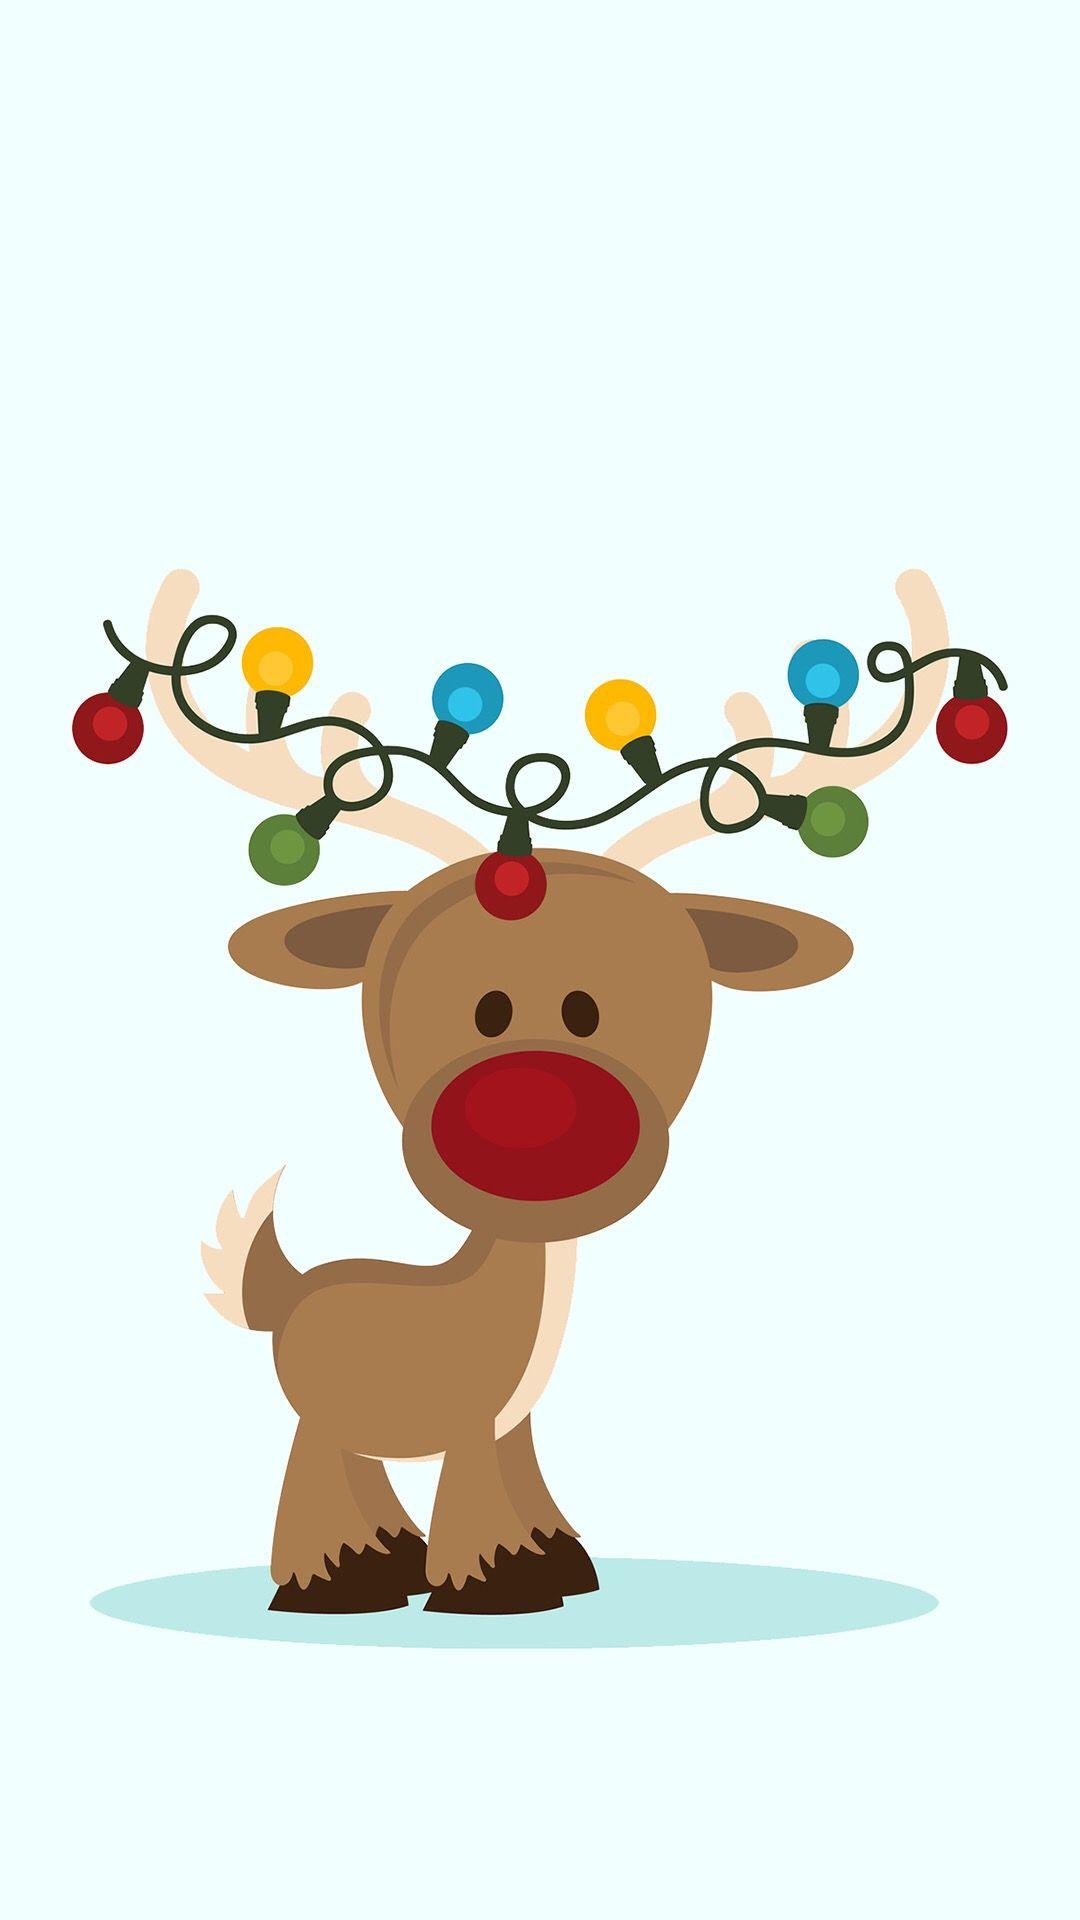 iPhone Wall: Christmas tjn | iPhone Walls: Christmas ...